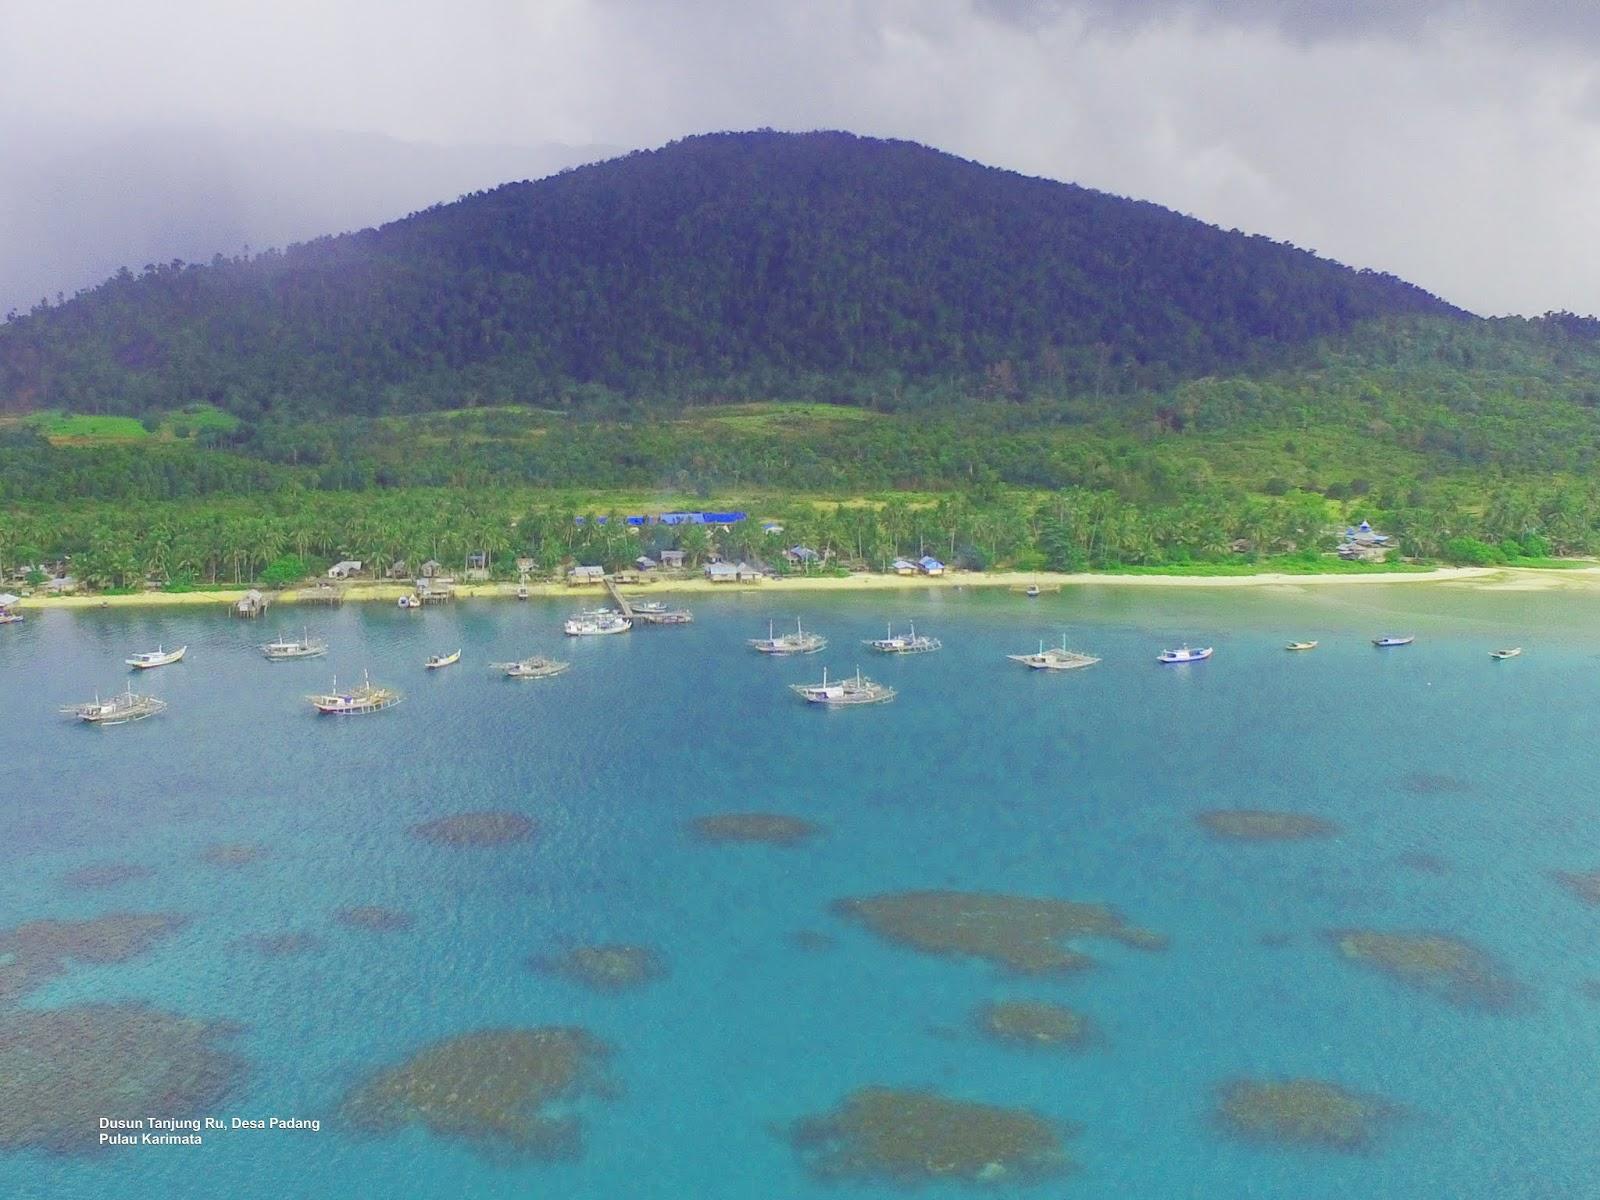 Indahnya Kepulauan Karimata Humpro Kku